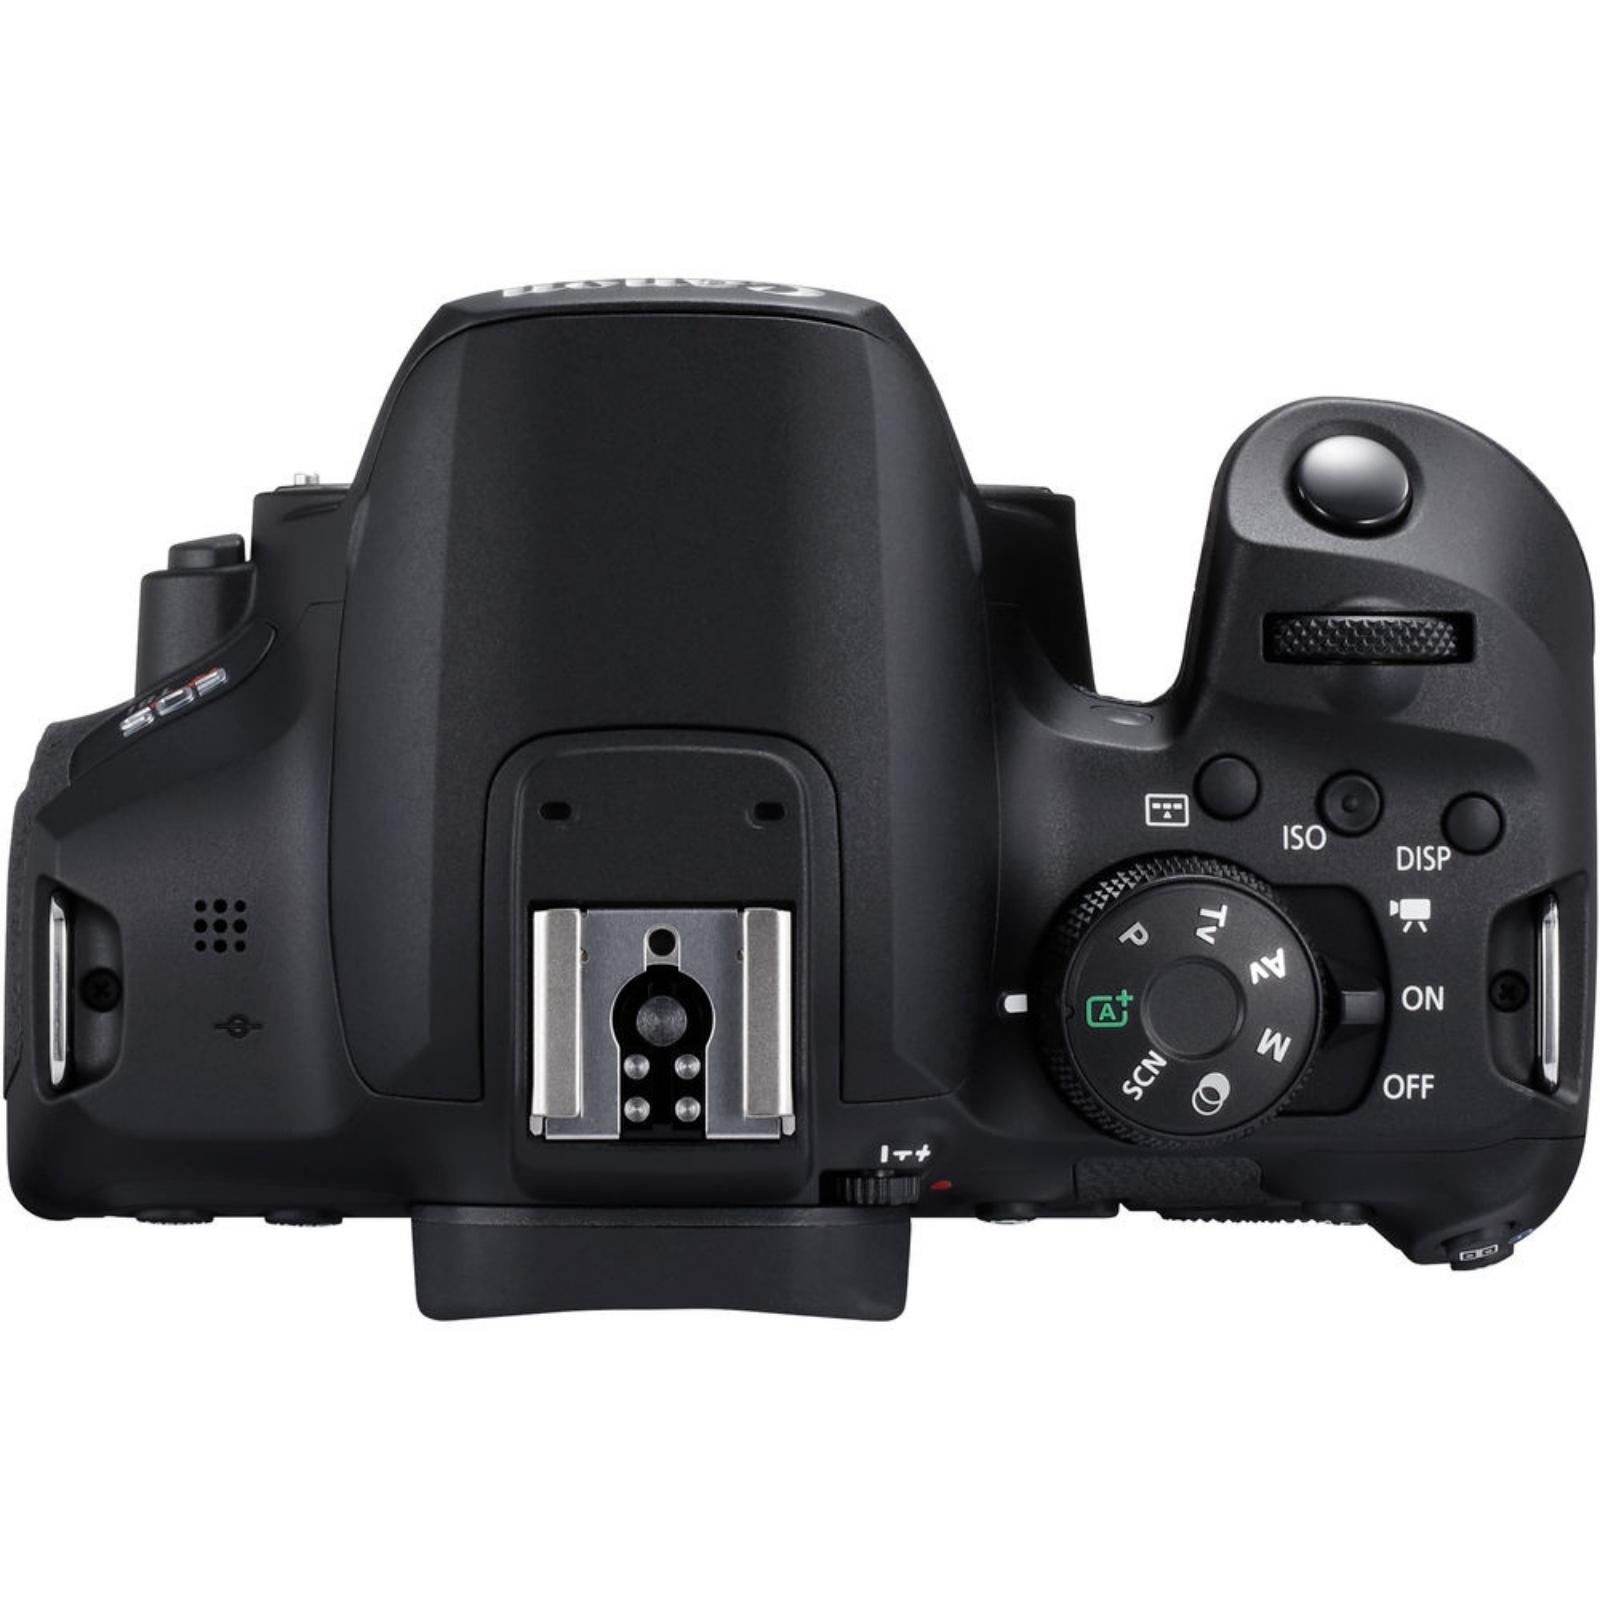 Canon キヤノン デジタル一眼レフカメラ EOS Kiss X10i ボディー ブラック EOSKISSX10I 新品